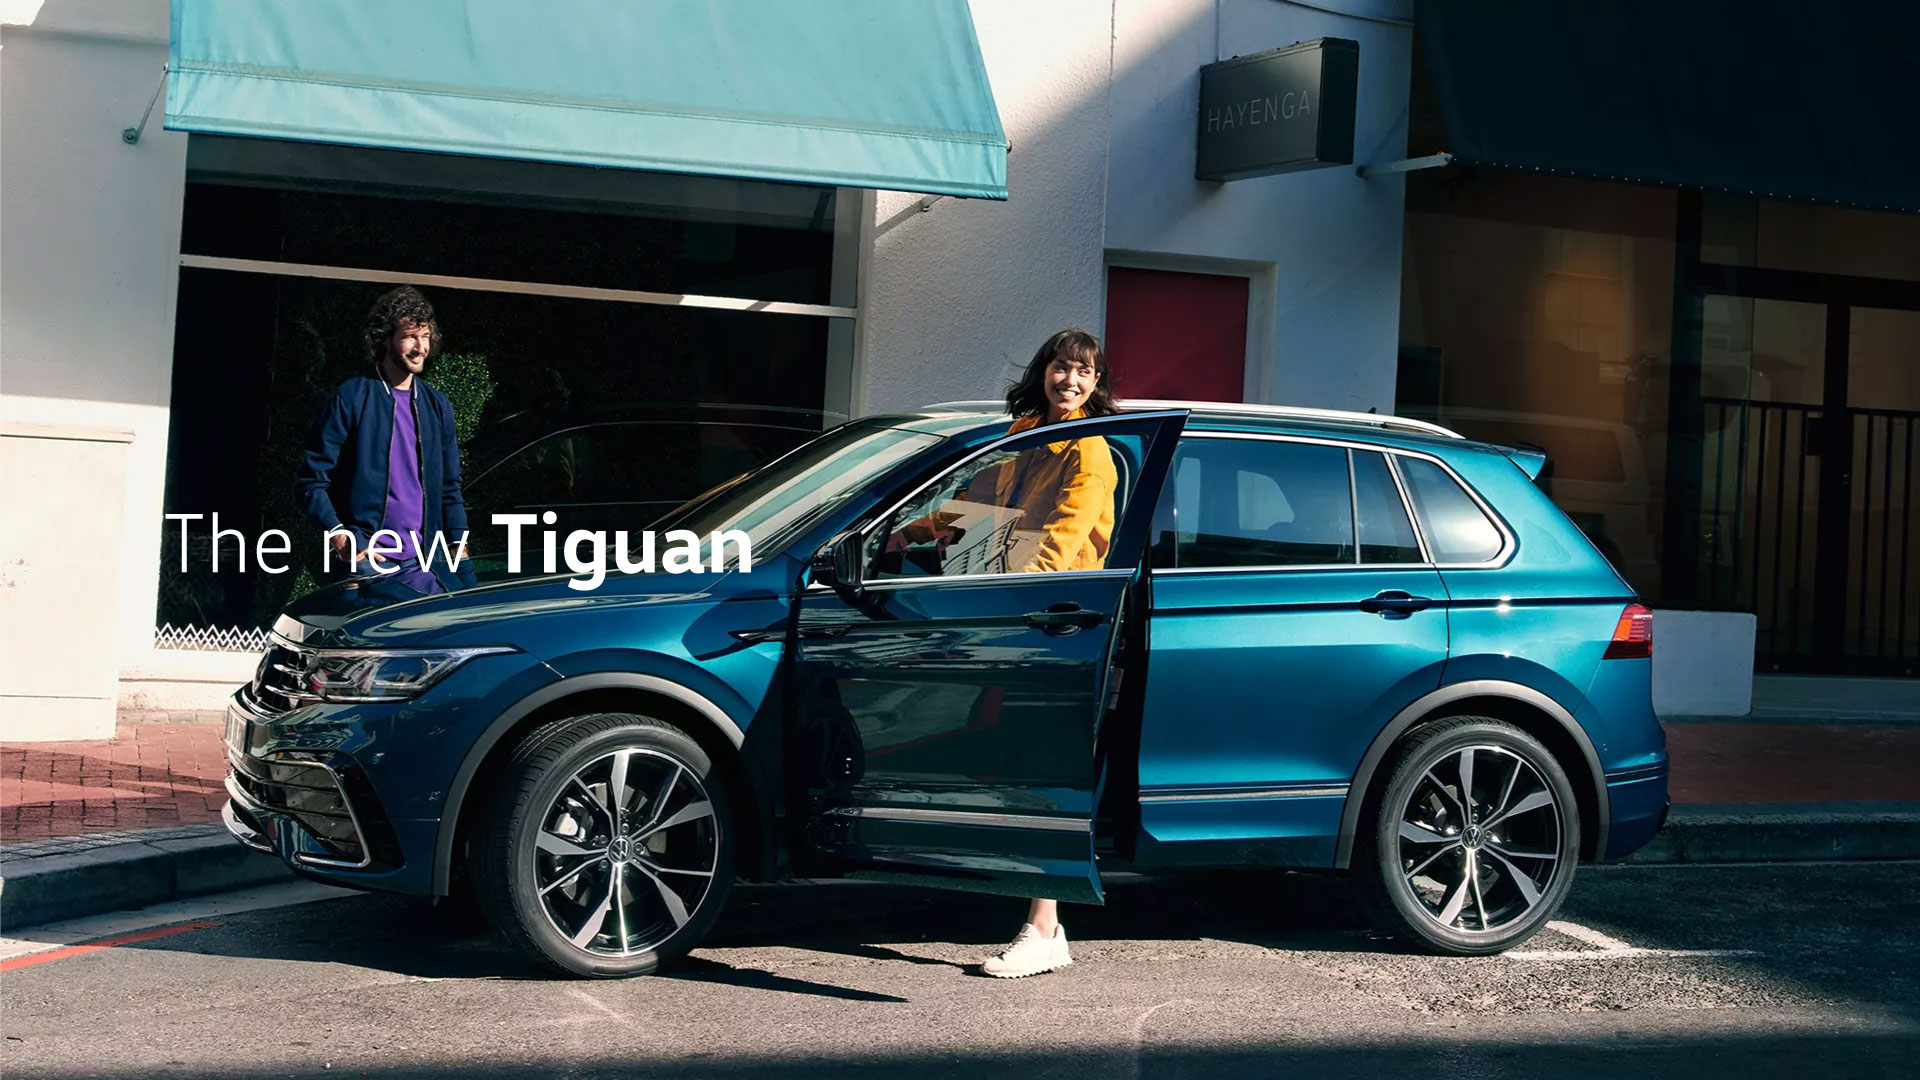 The new Tiguan